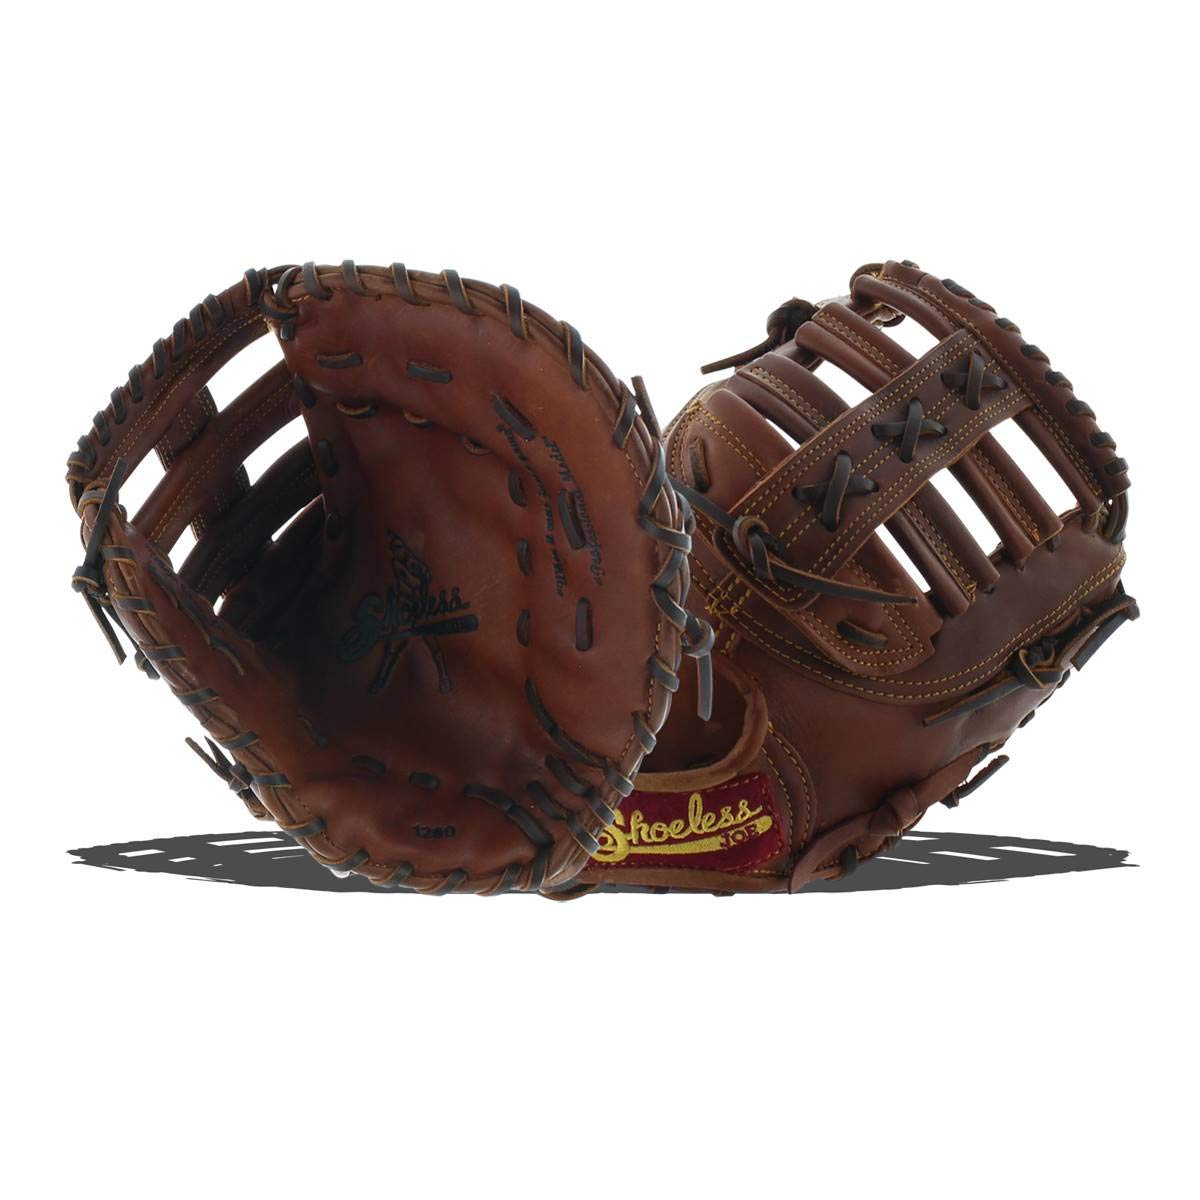 Shoeless Joe Adult 12'' First Base Glove Size: Lht No Color by Shoeless Joe